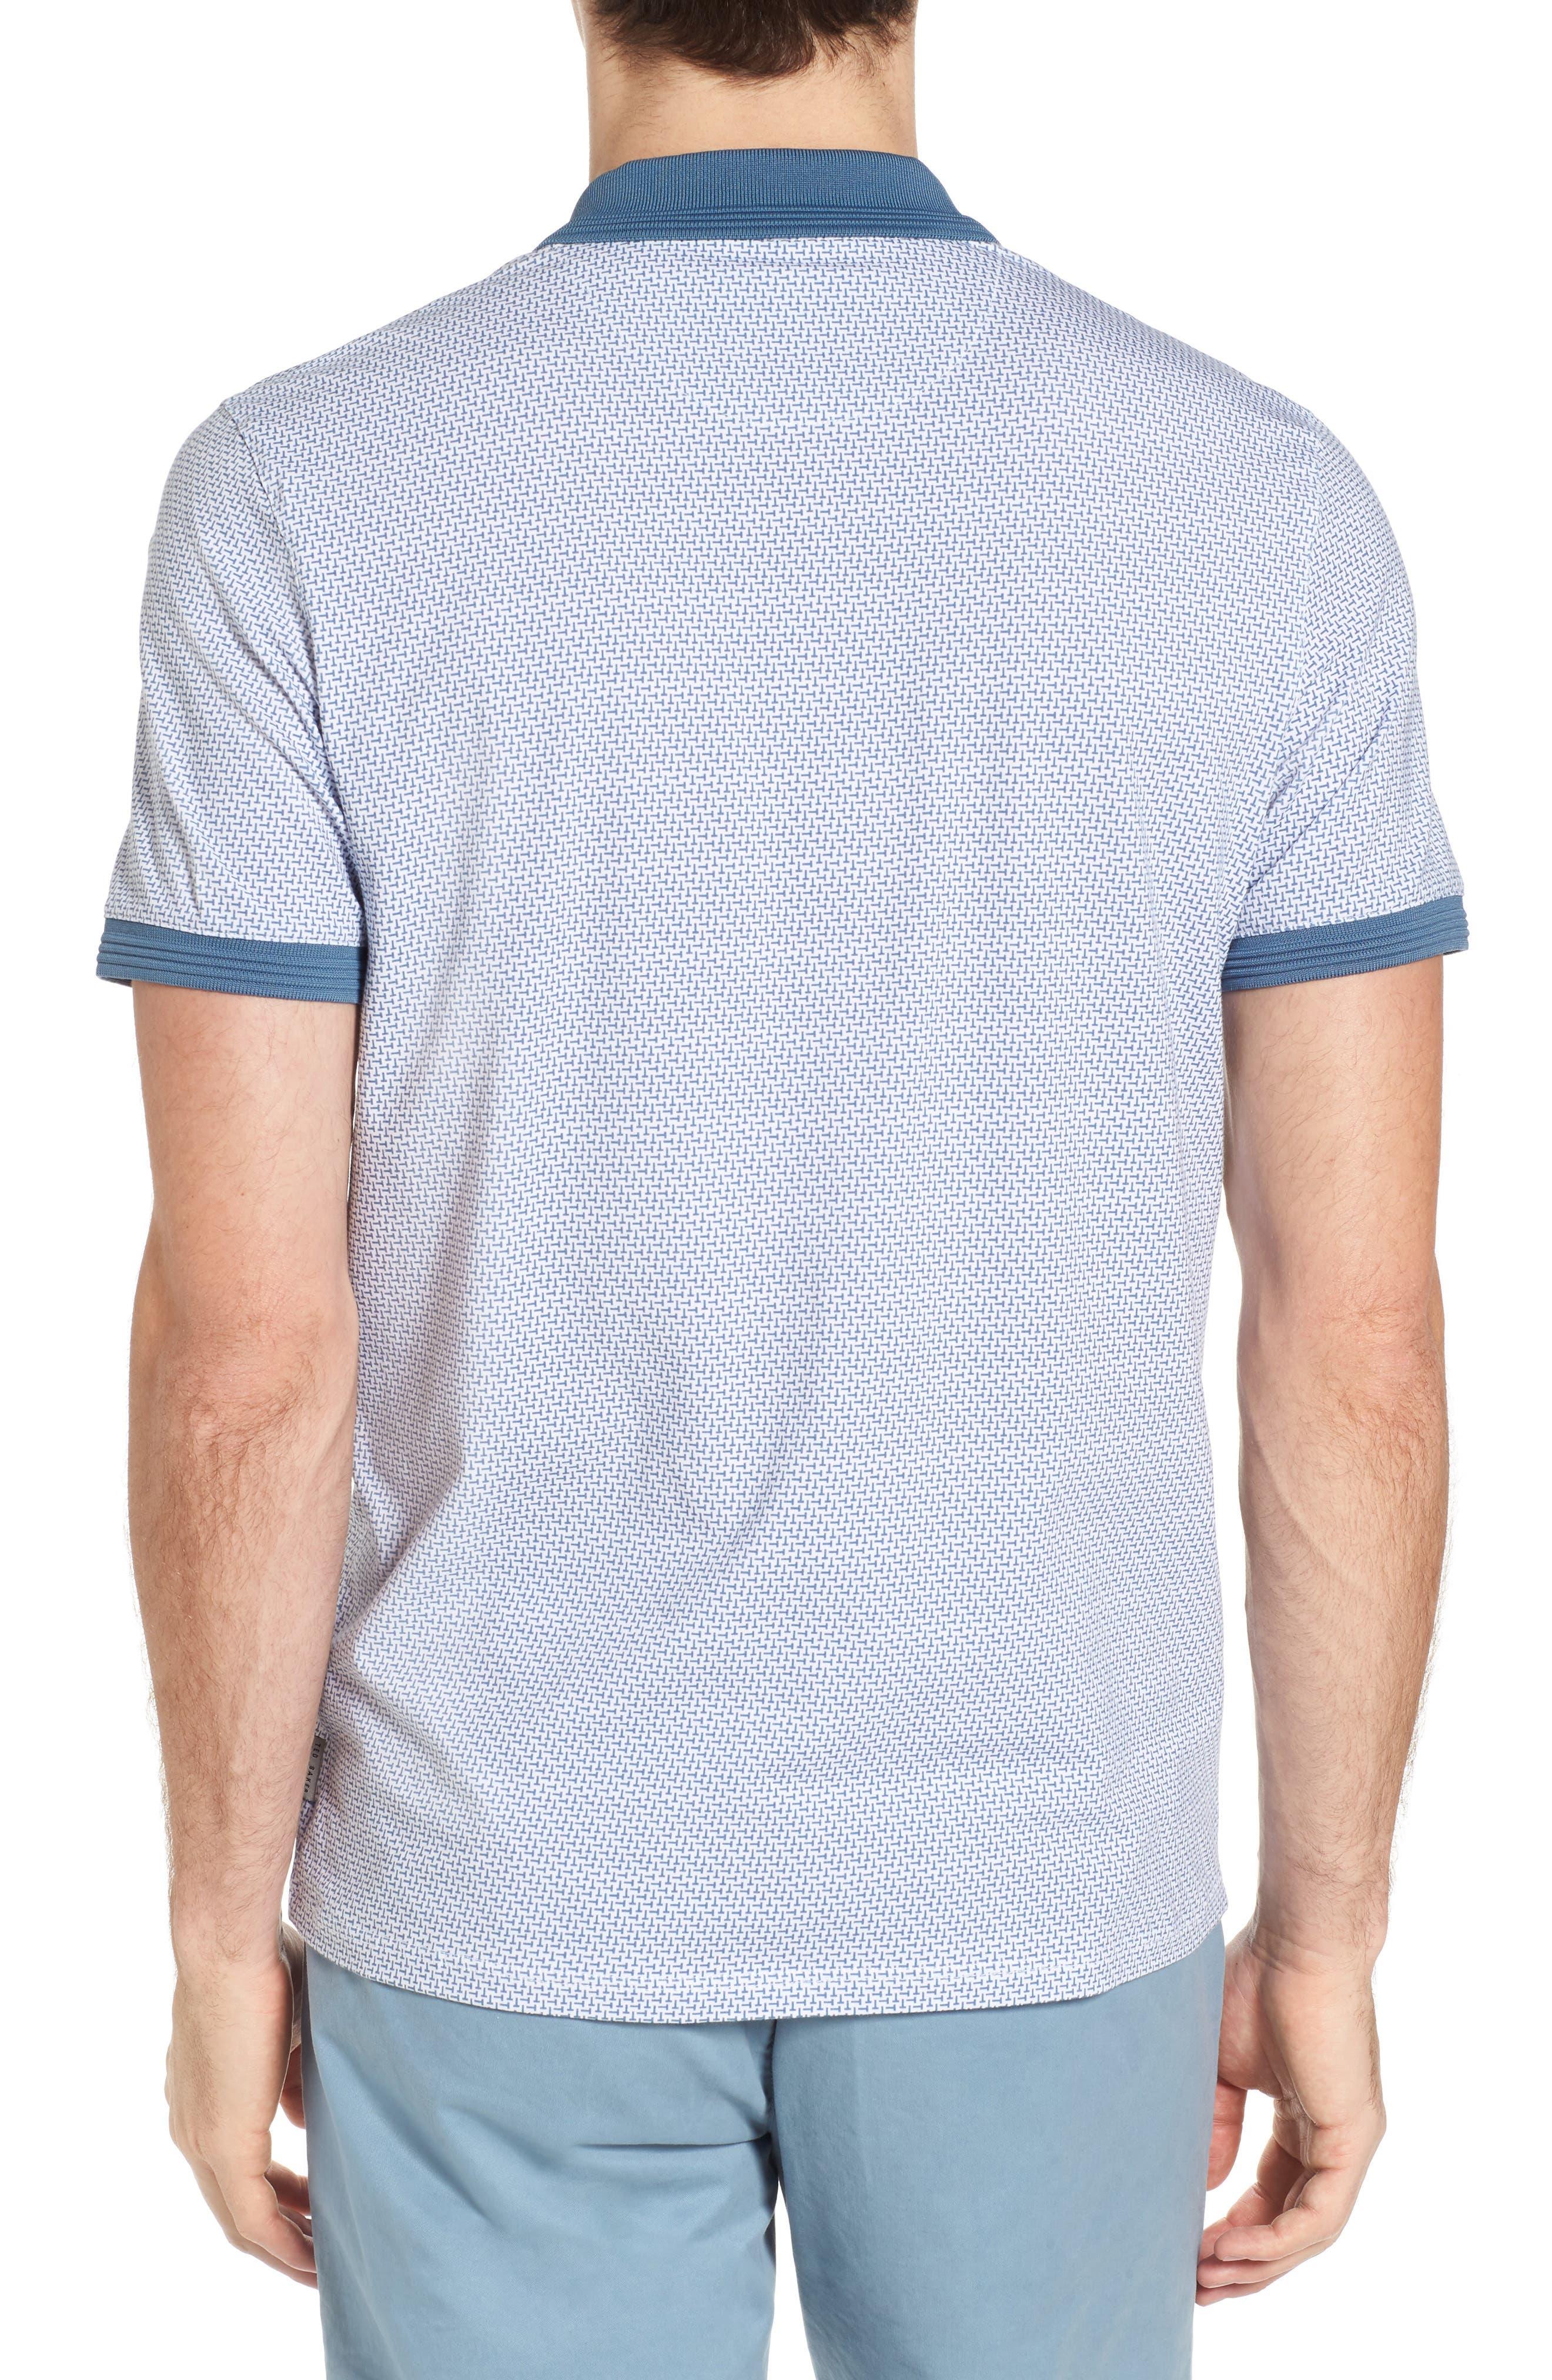 Sloughi Trim Fit Stretch Polo Shirt,                             Alternate thumbnail 2, color,                             Blue